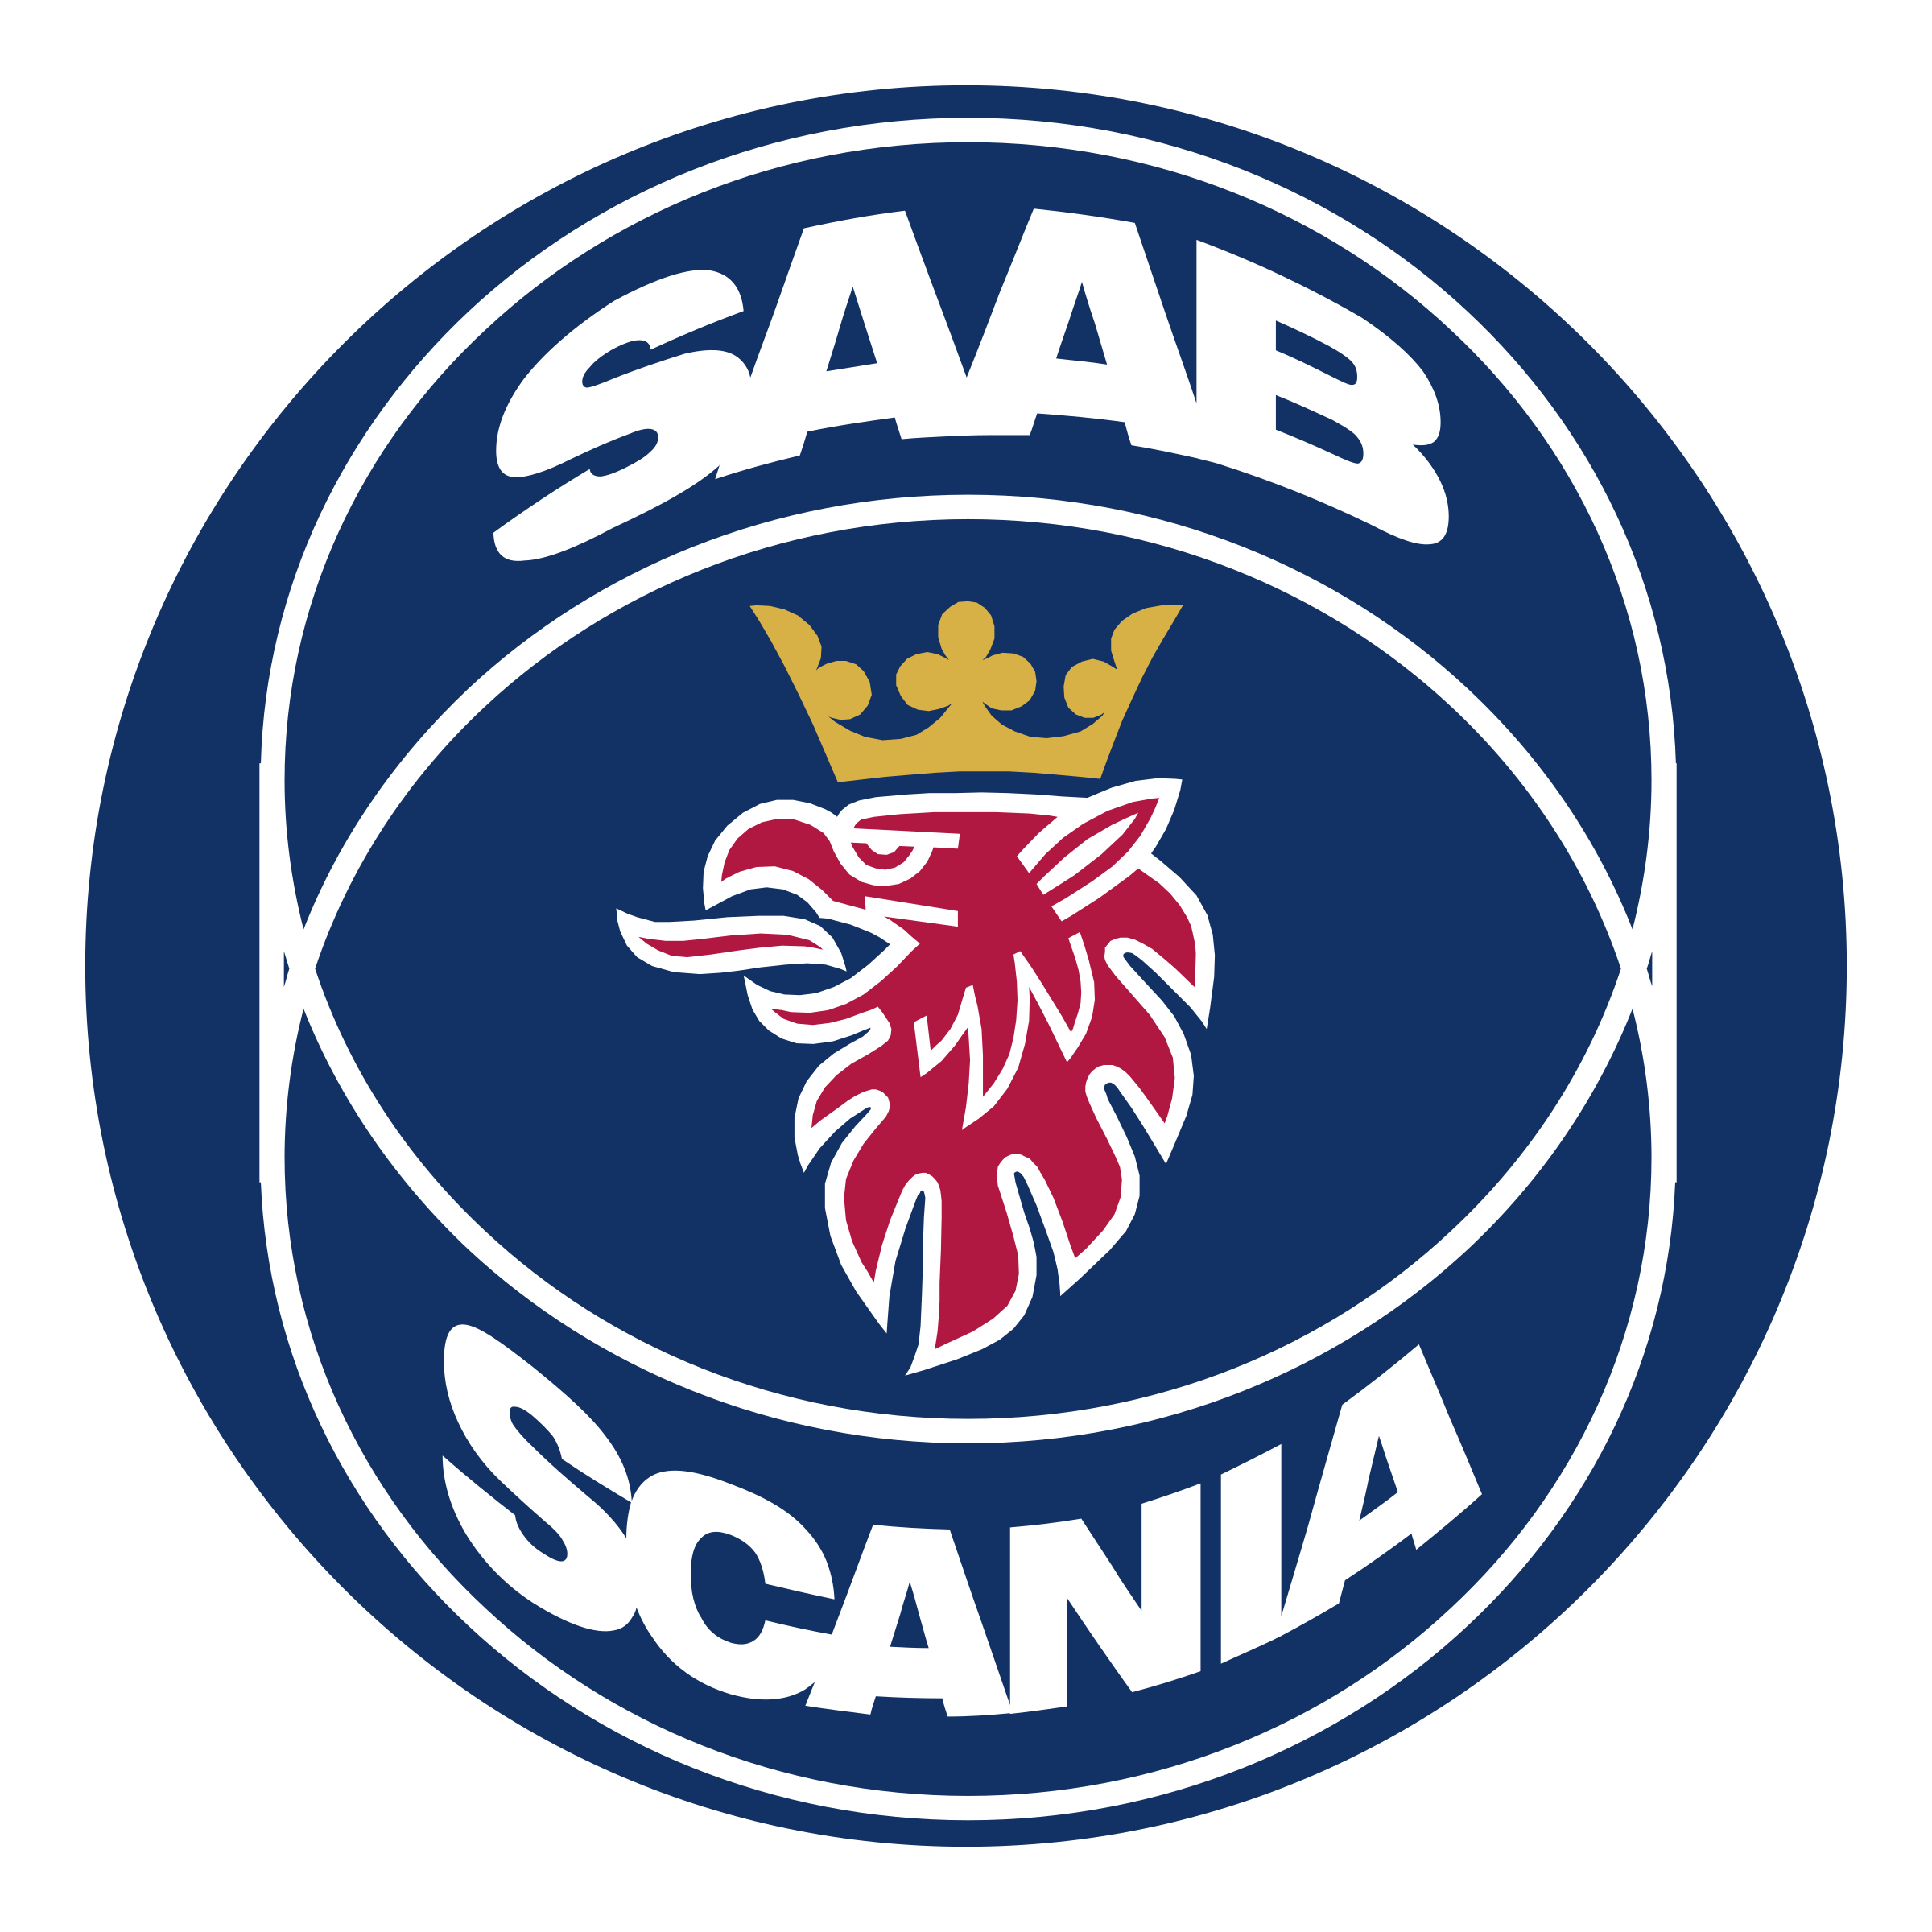 SAAB Scania Logo PNG Transparent & SVG Vector.